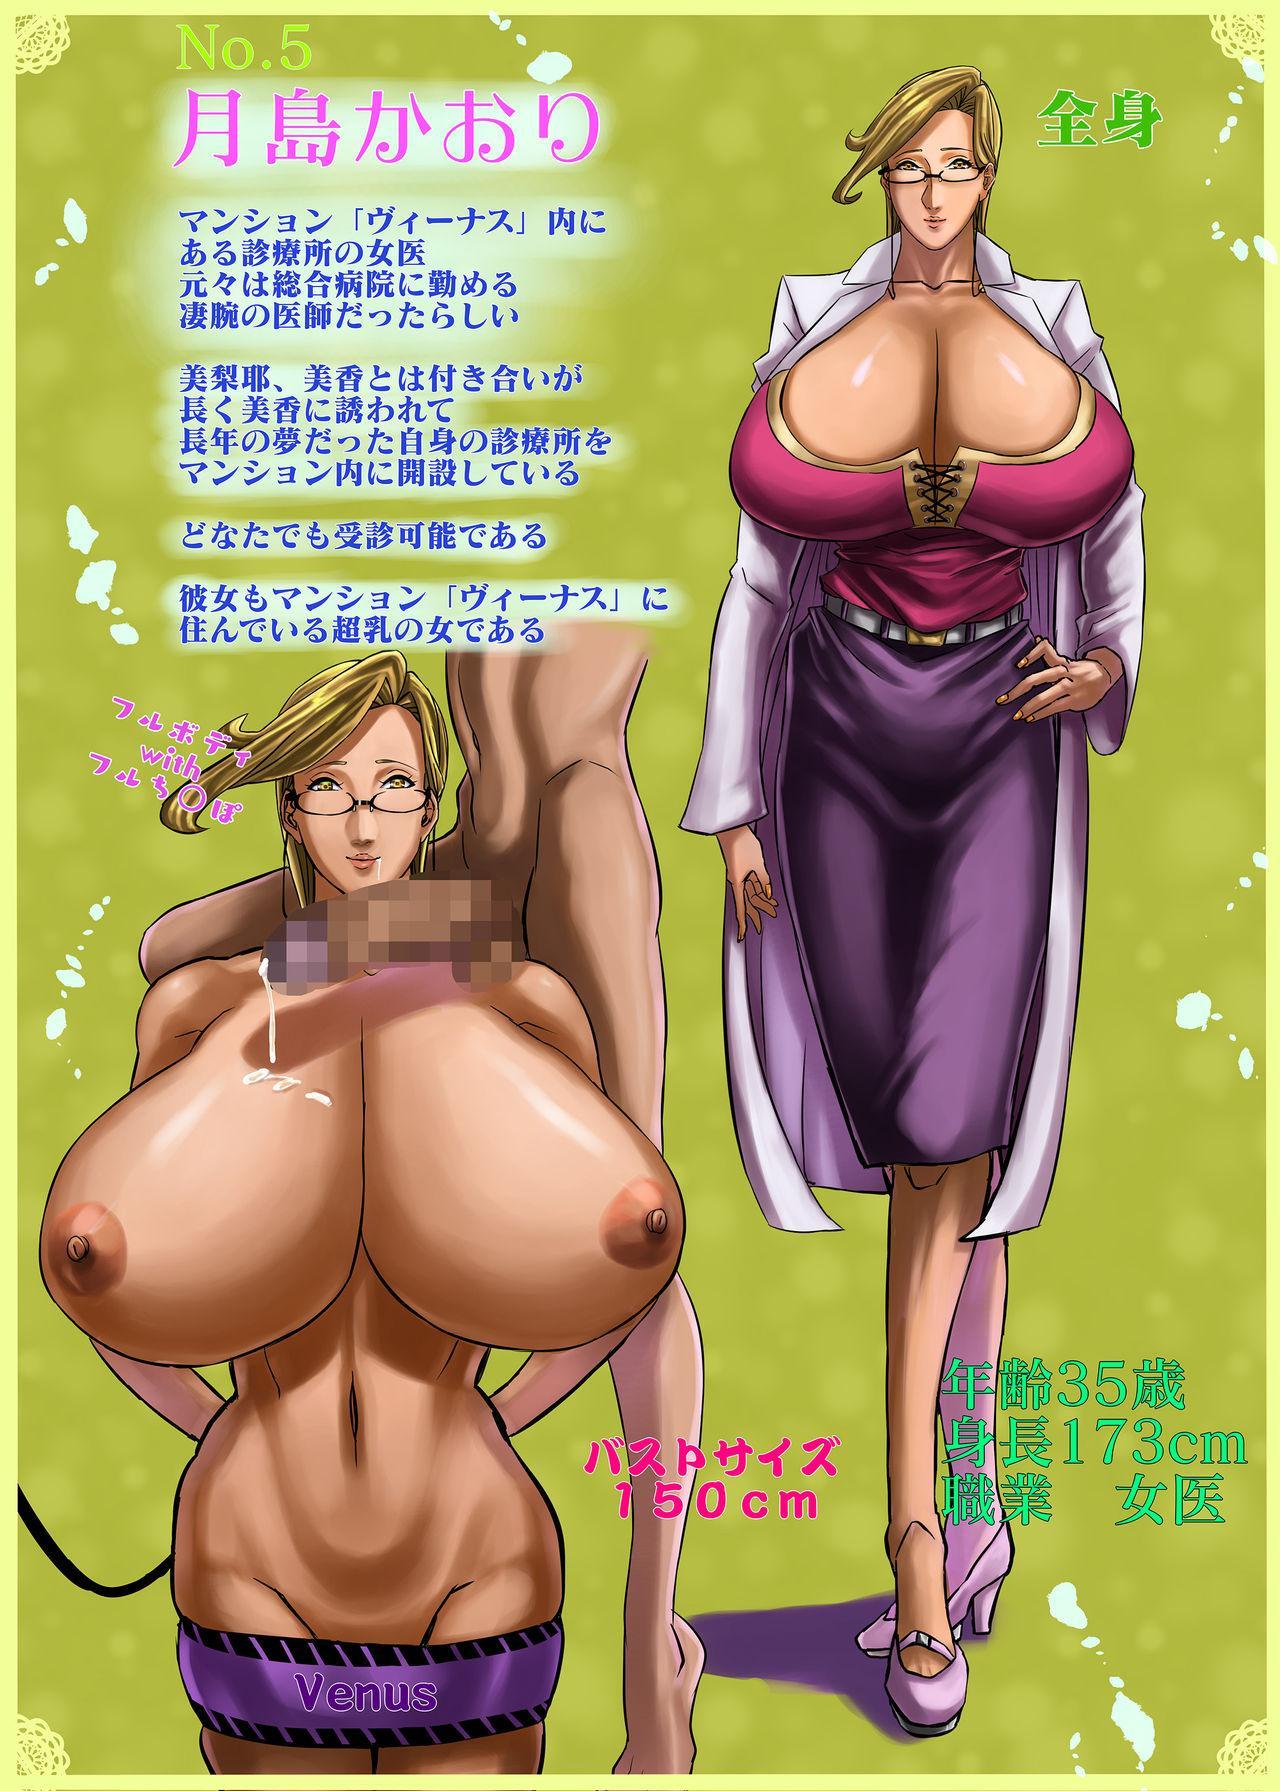 Venus Mansion Episode 5 55